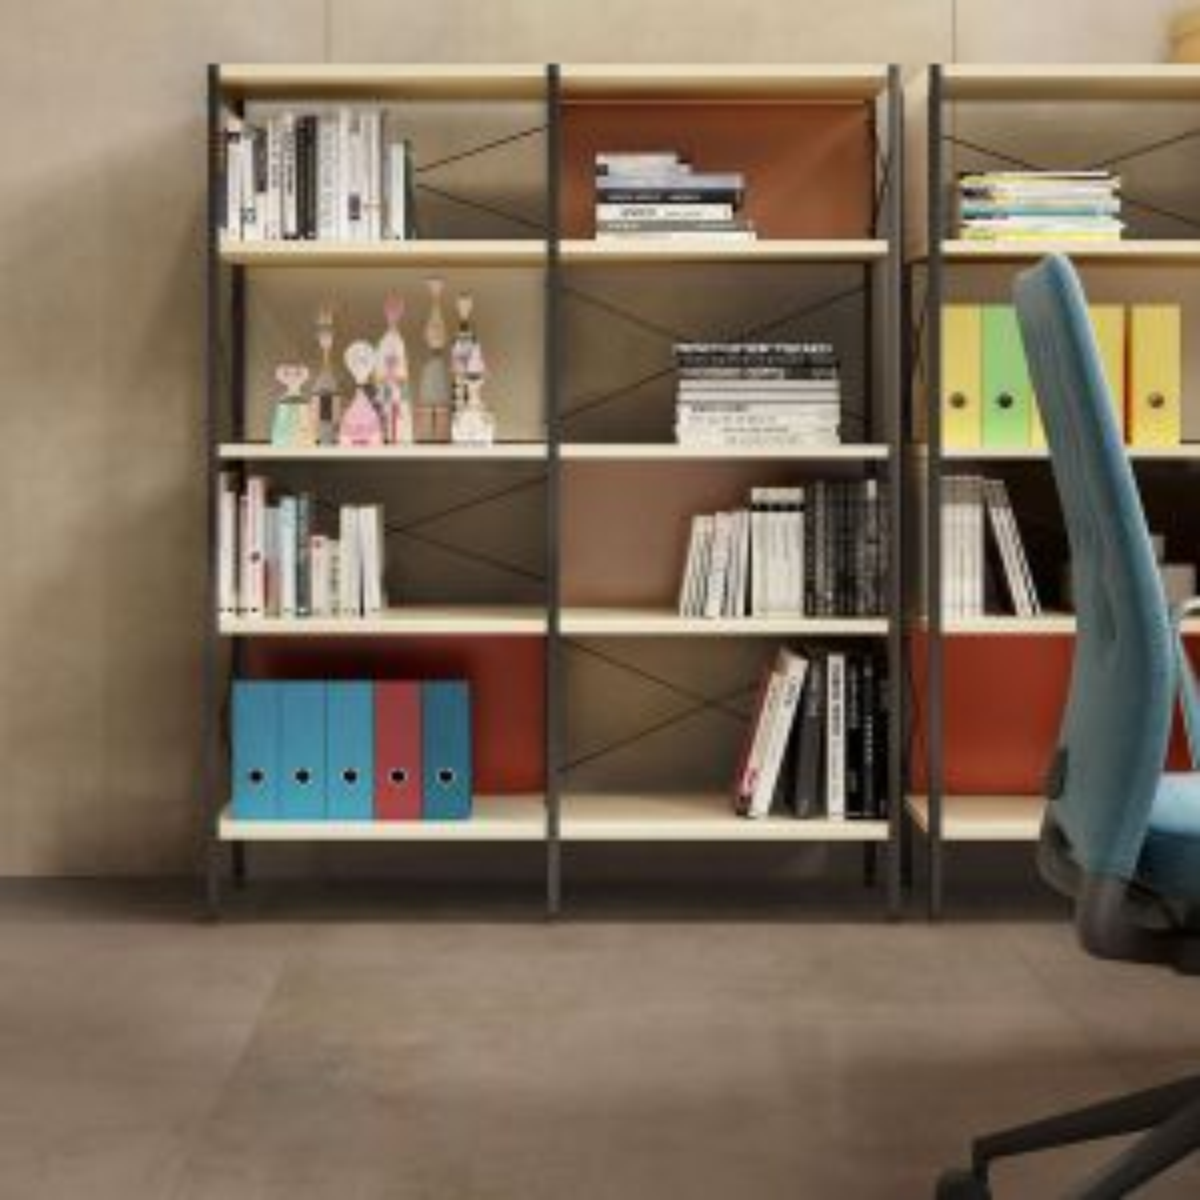 RAK Surface Charcoal Lappato Tile 750 x 750mm Lifestyle